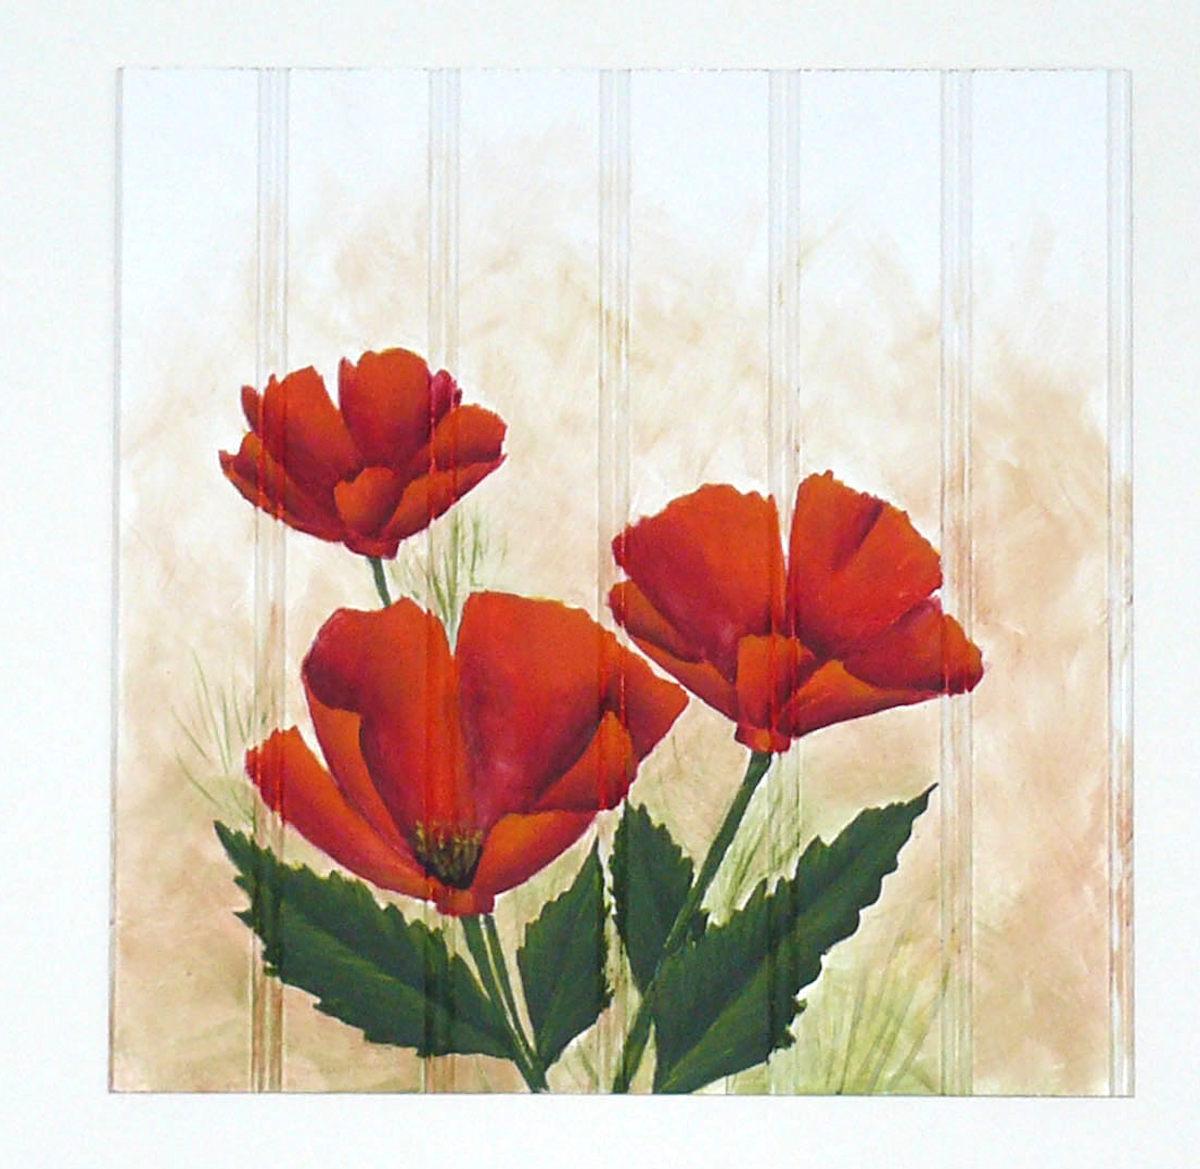 ah-poppies-on-bead-board-18031.jpg